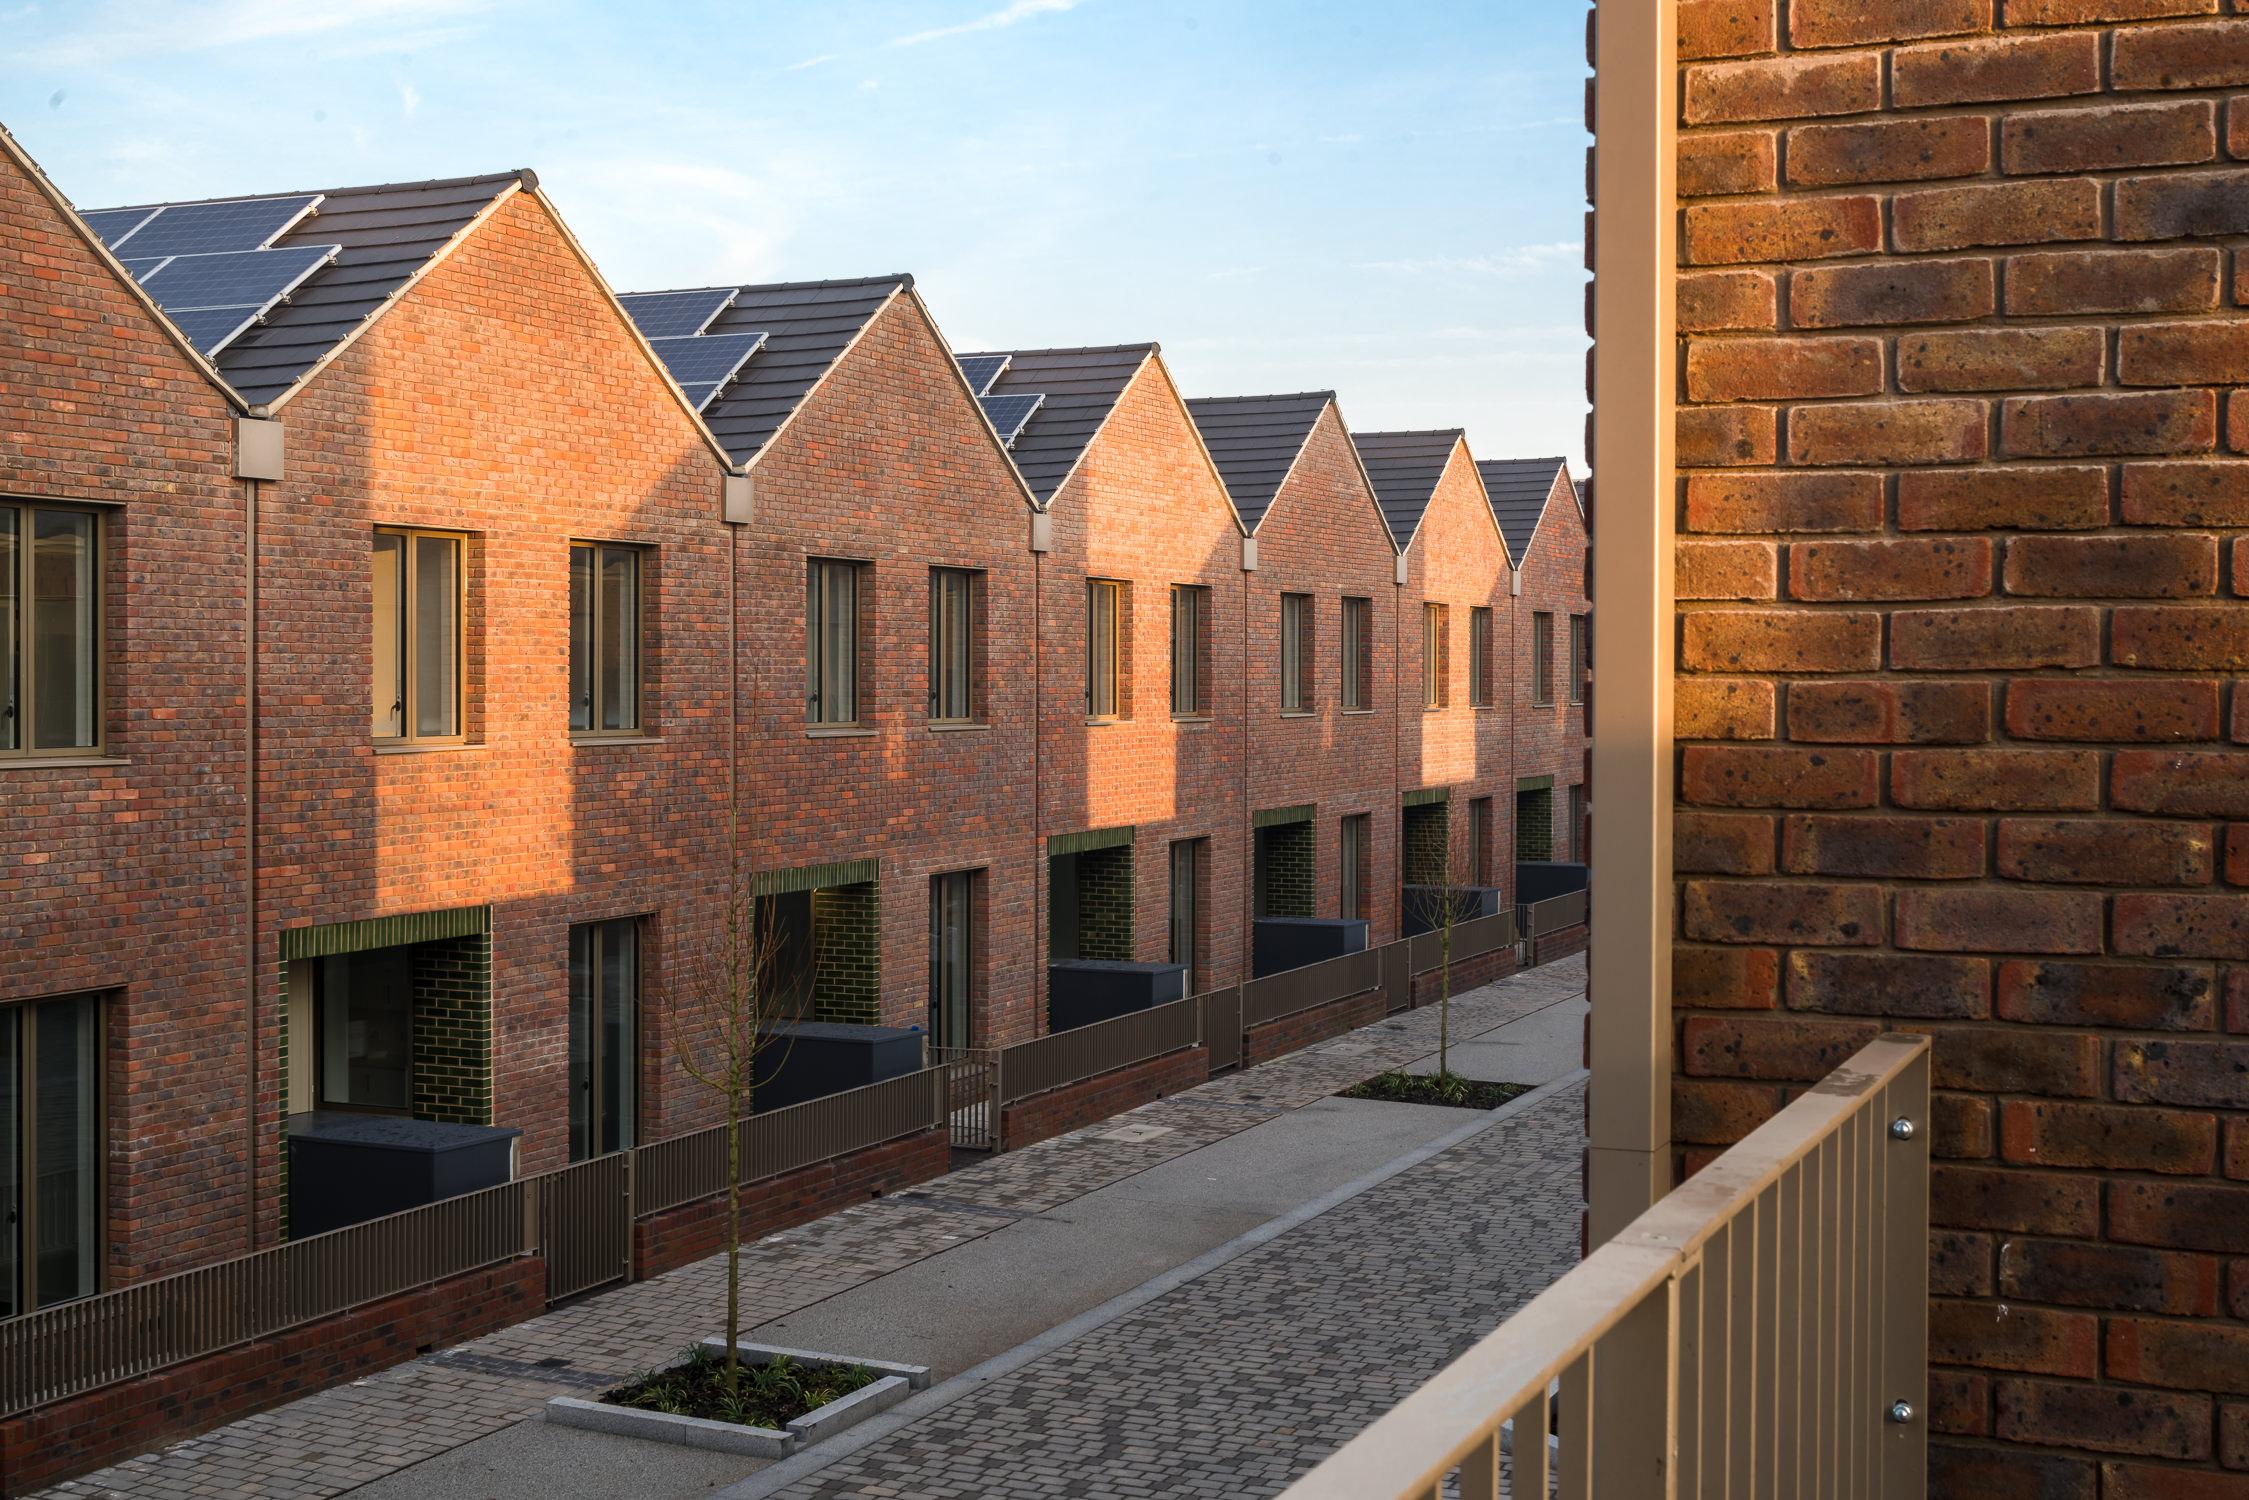 mark-hadden-architecture-photographer-architectuur-interieur-fotografie-london-amsterdam-Dujardin Mews-056.jpg